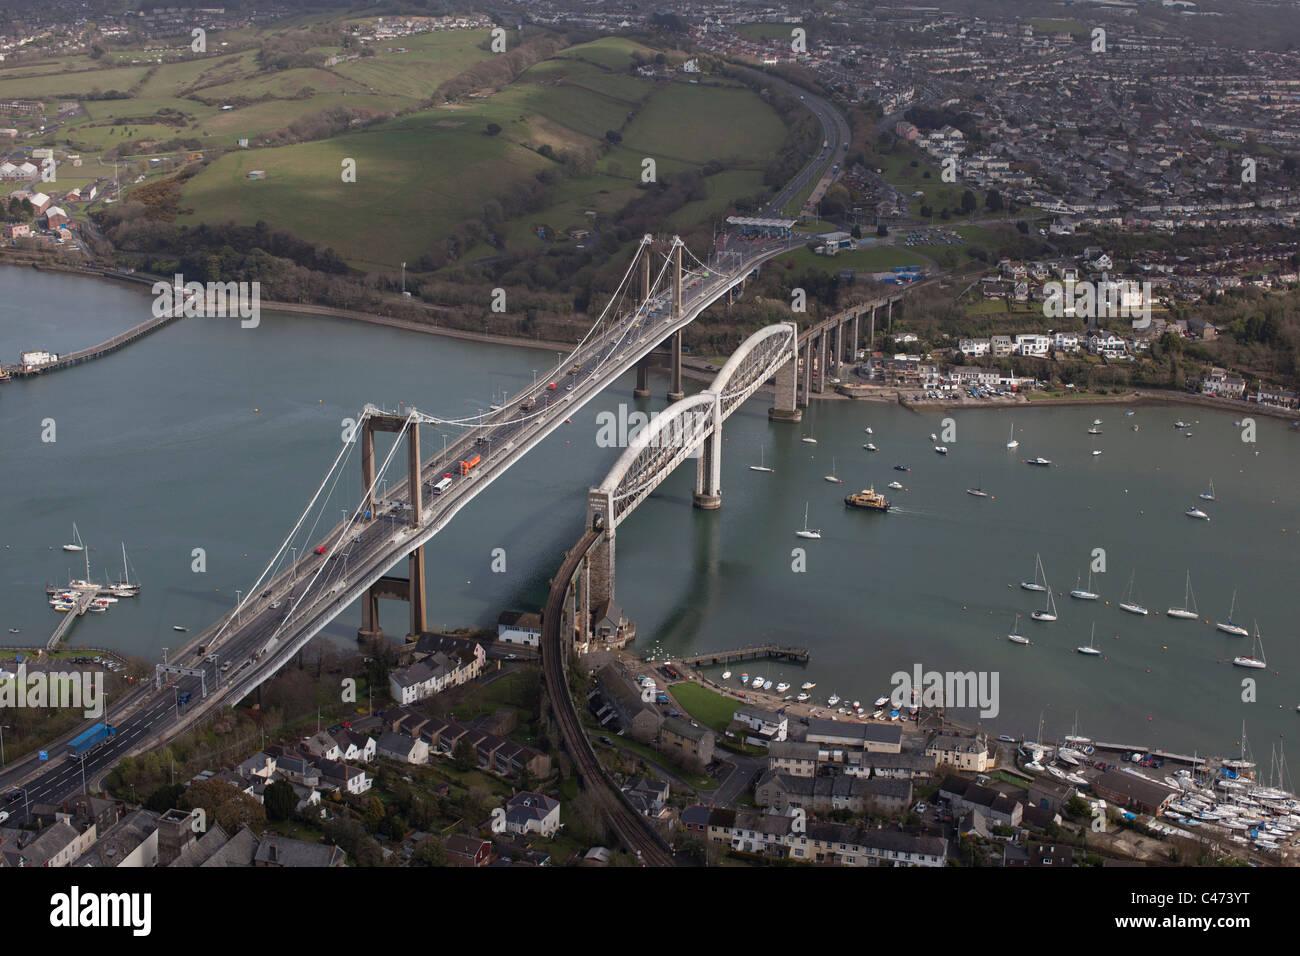 Aerial view of the Tamar Road Bridge and Isambard Kingdom Brunel's Royal Albert Bridge, Plymouth, Devon, UK Stock Photo